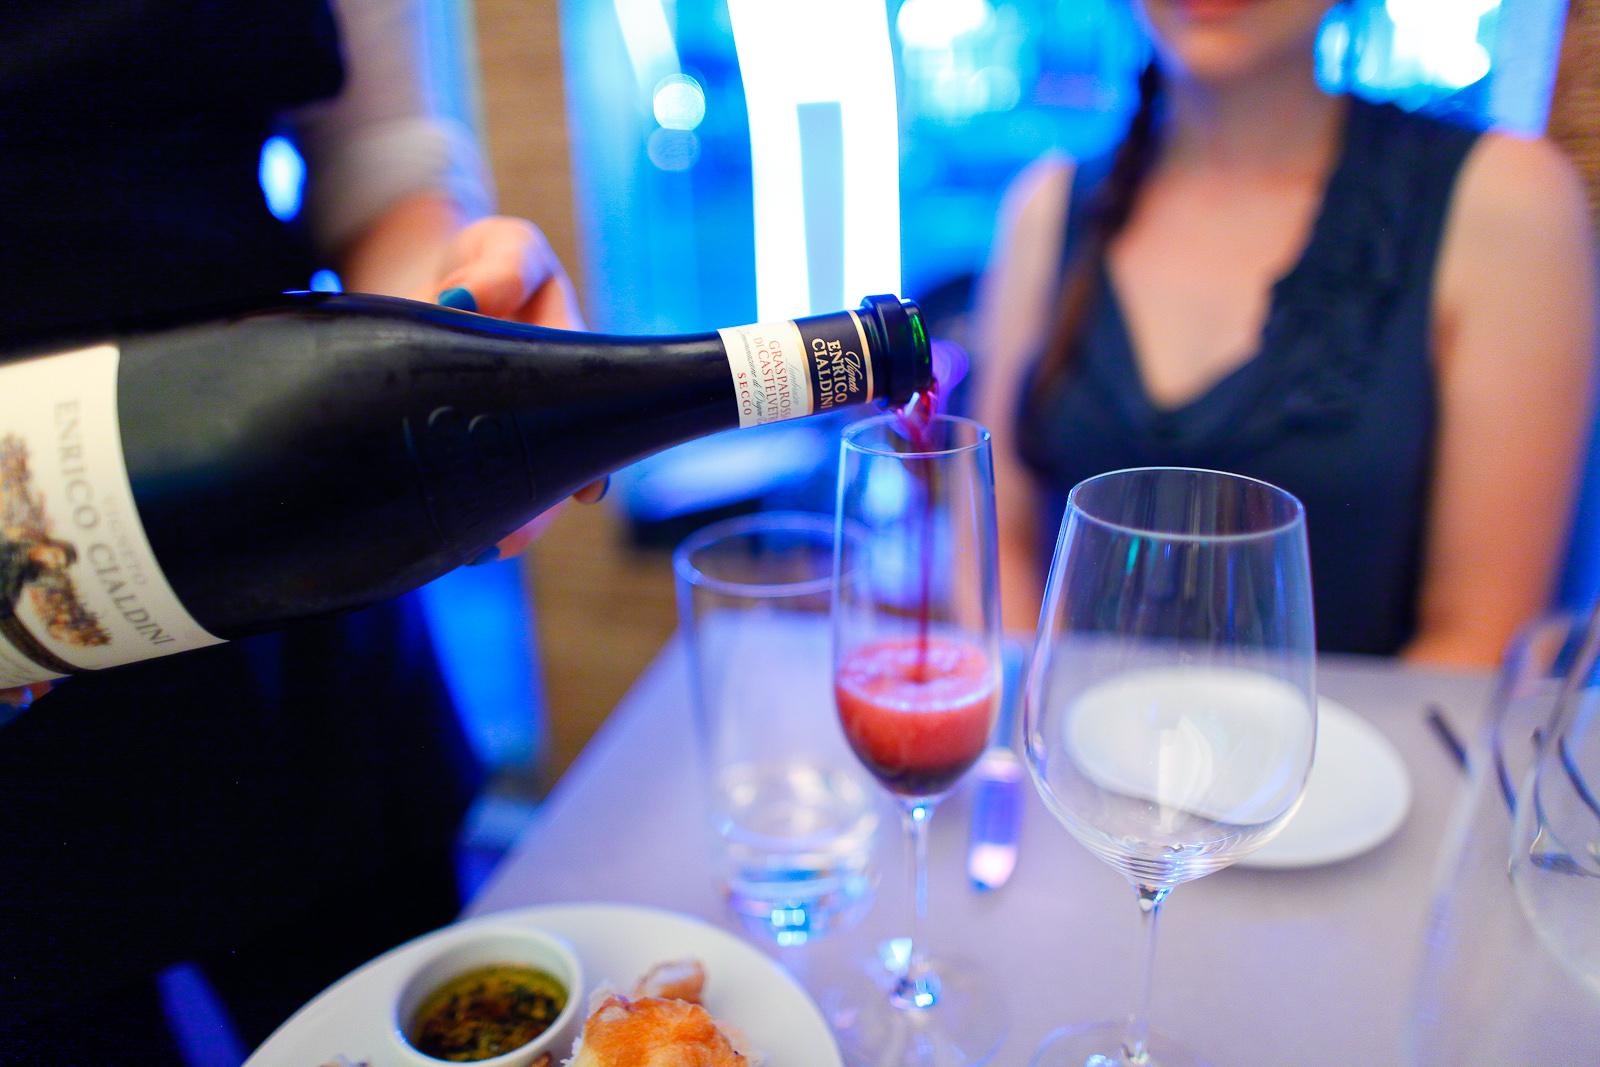 Cleto Chiarli Lambrusco - sparkling red wine ($5)